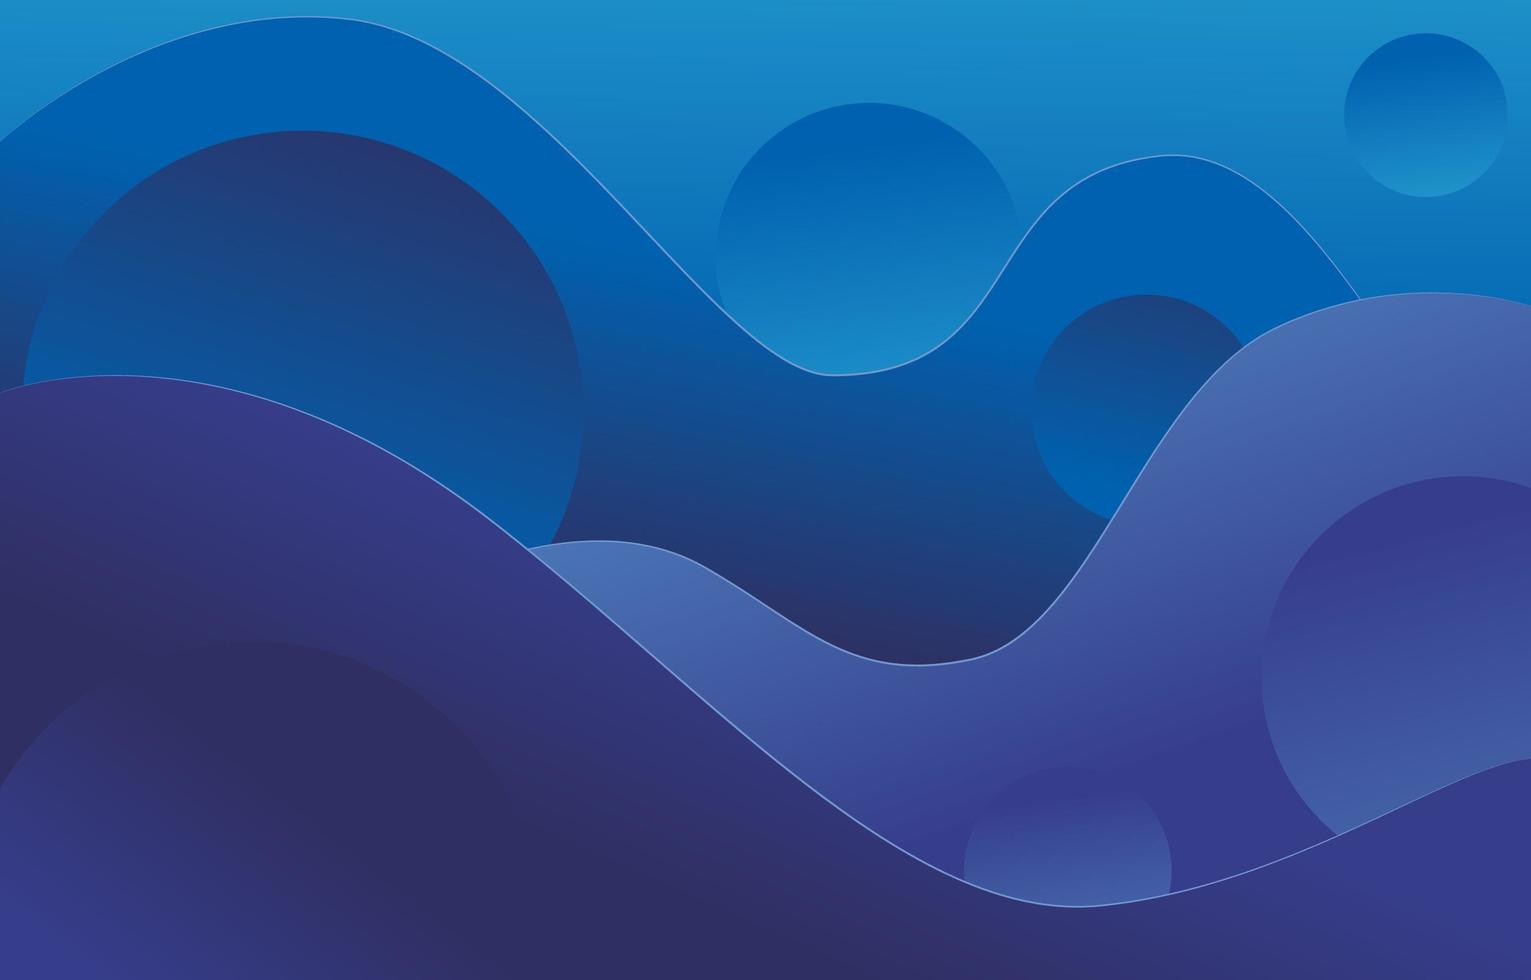 moderne abstracte blauwe en paarse achtergrond met kleurovergang vector